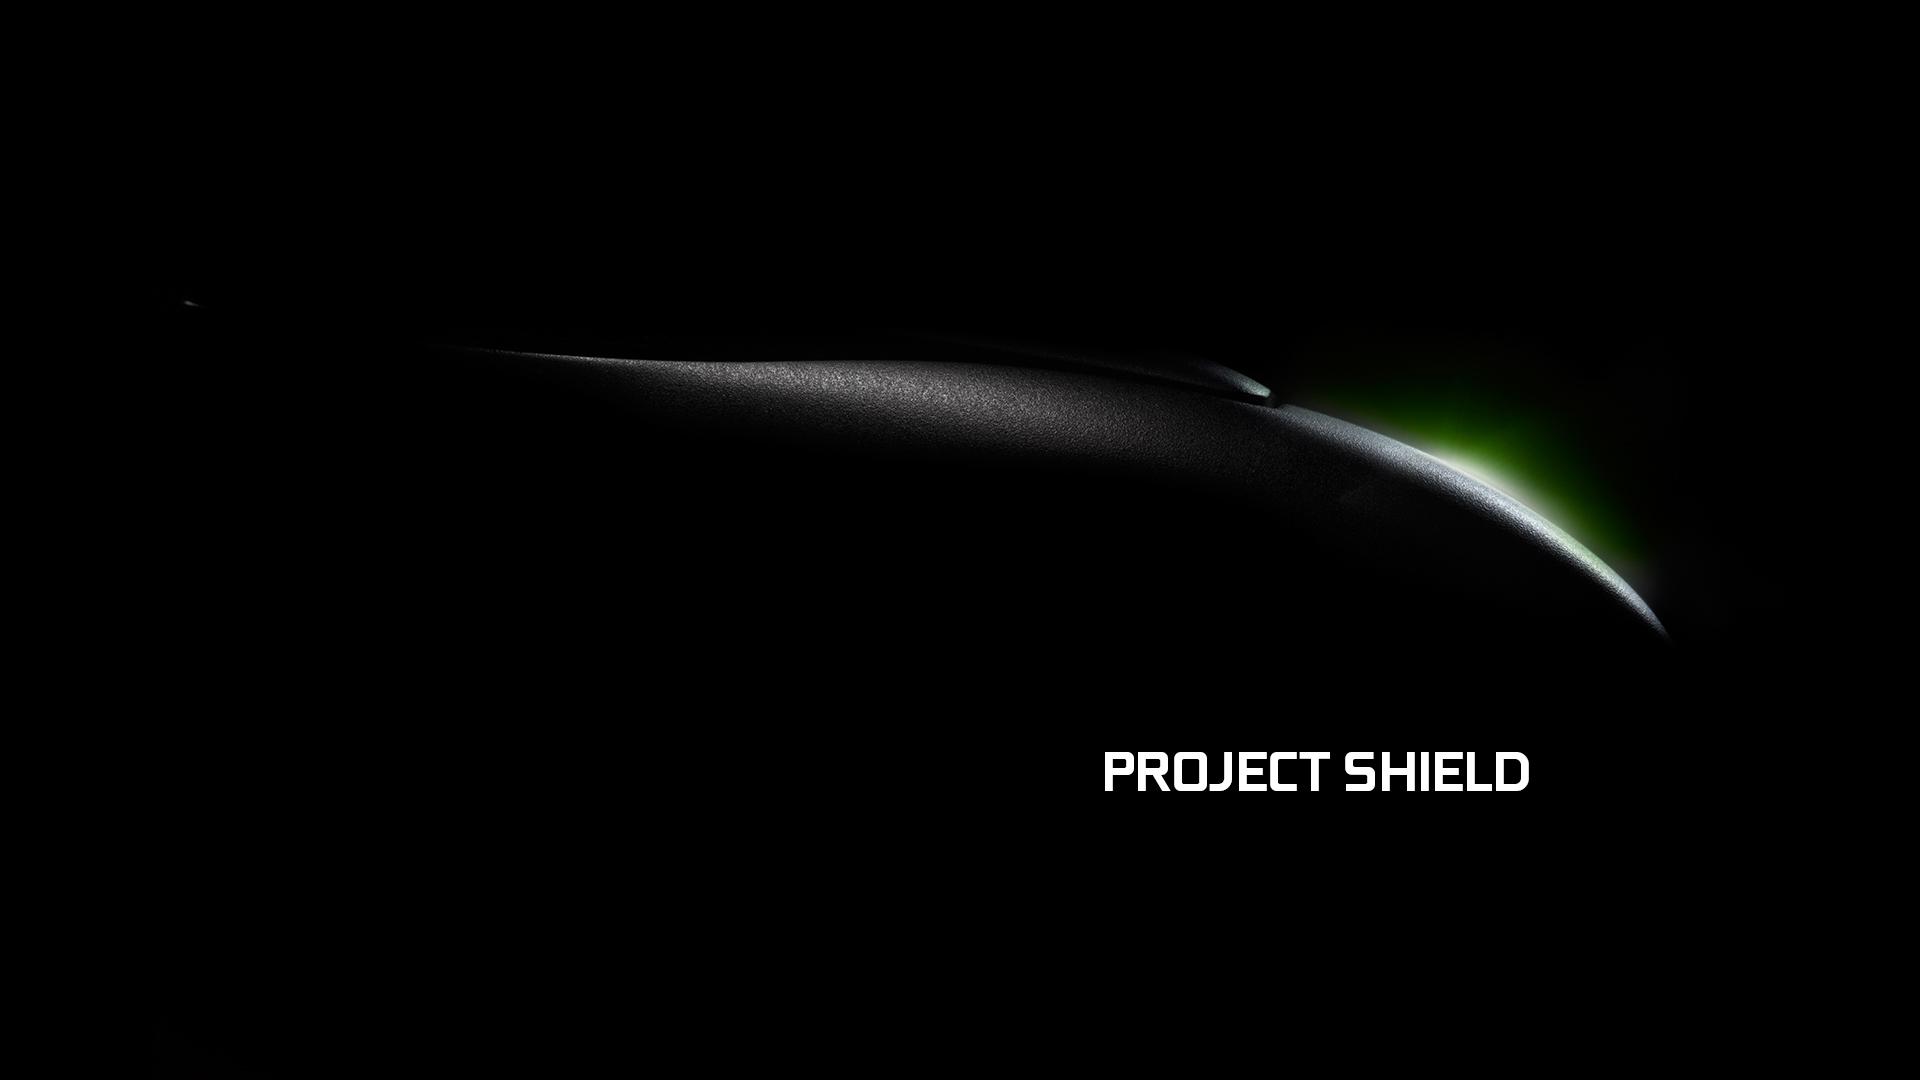 Nvidia Project Shield Wallpaper